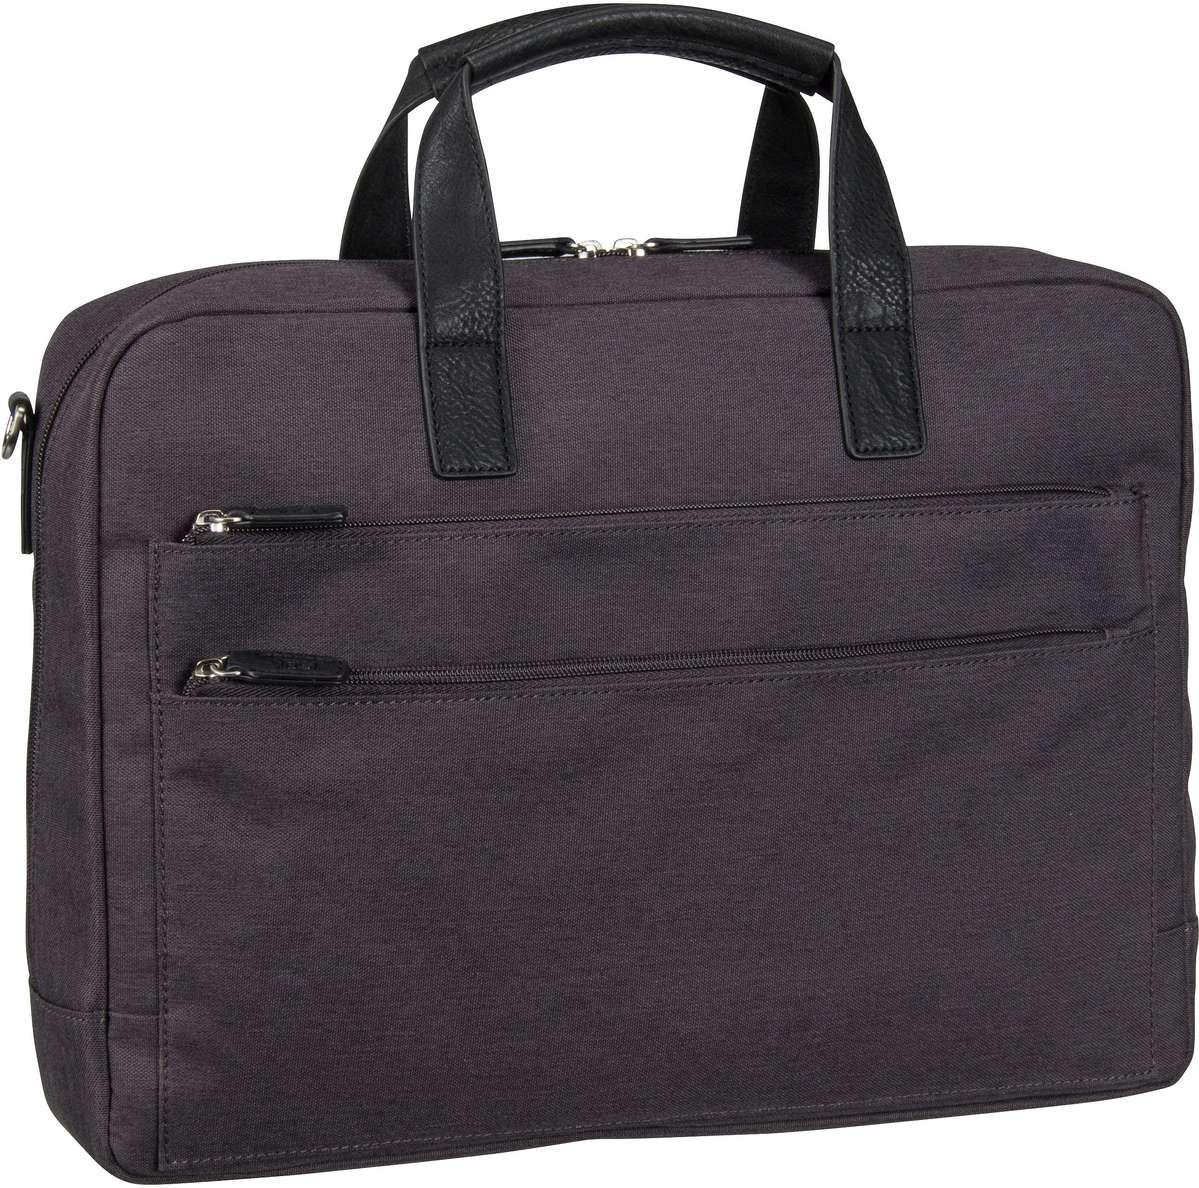 Jost Notebooktasche / Tablet Bergen 1143 Business Bag Dark Grey